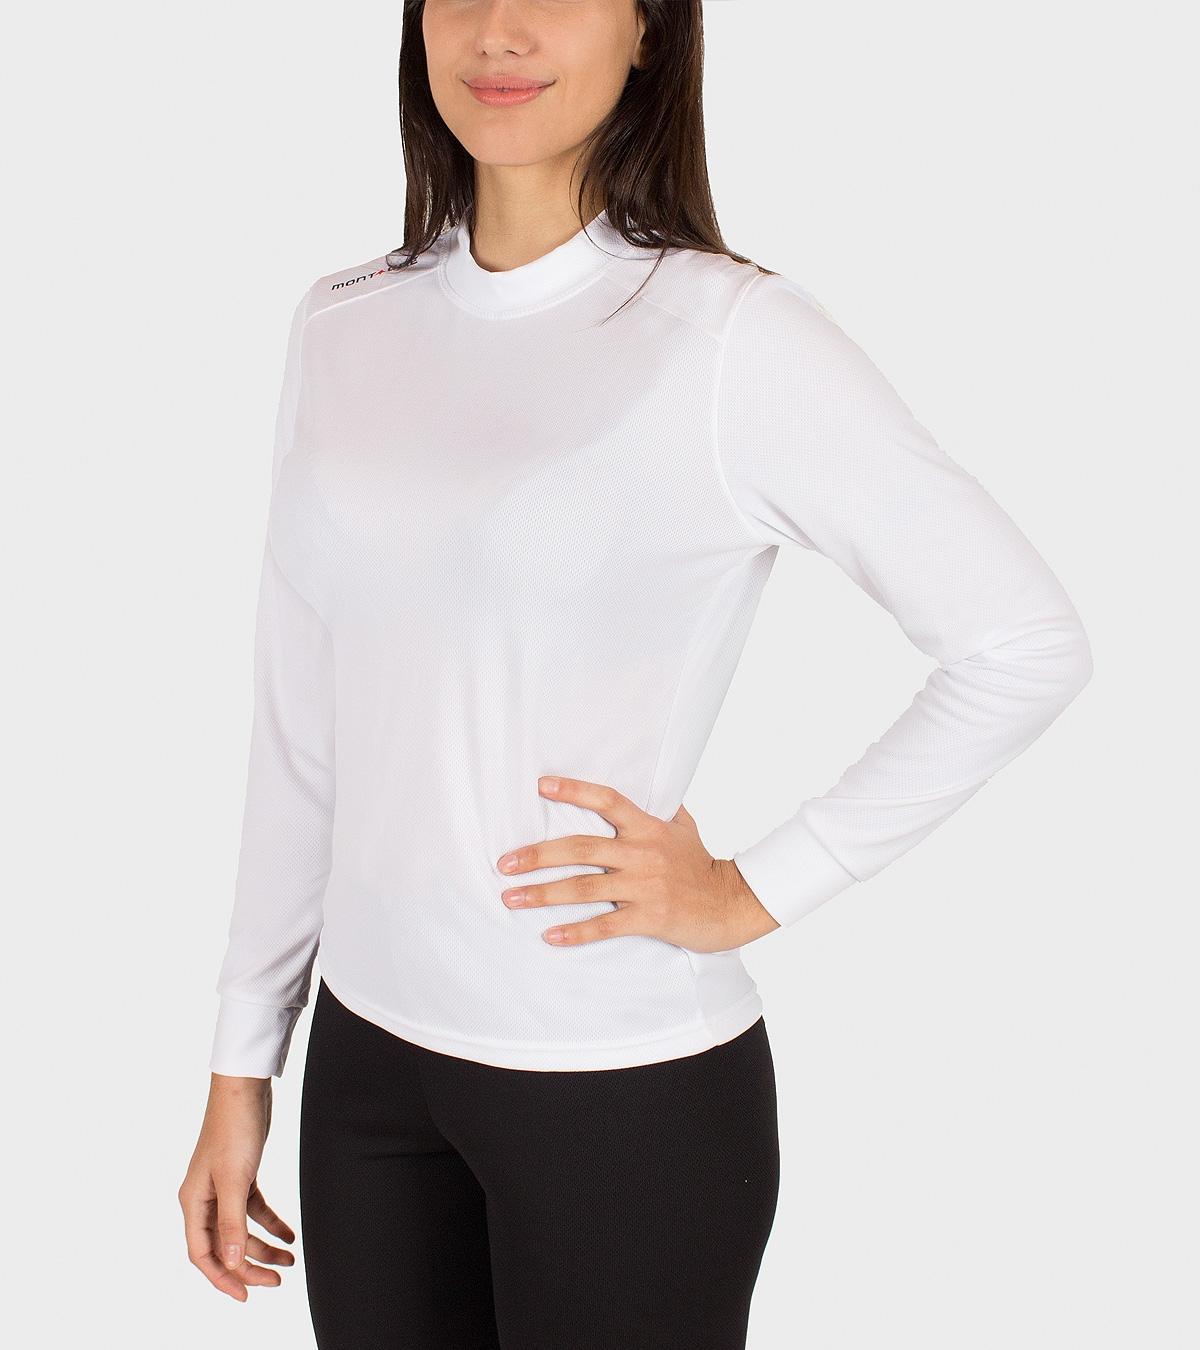 Camiseta térmica de mujer Olympia